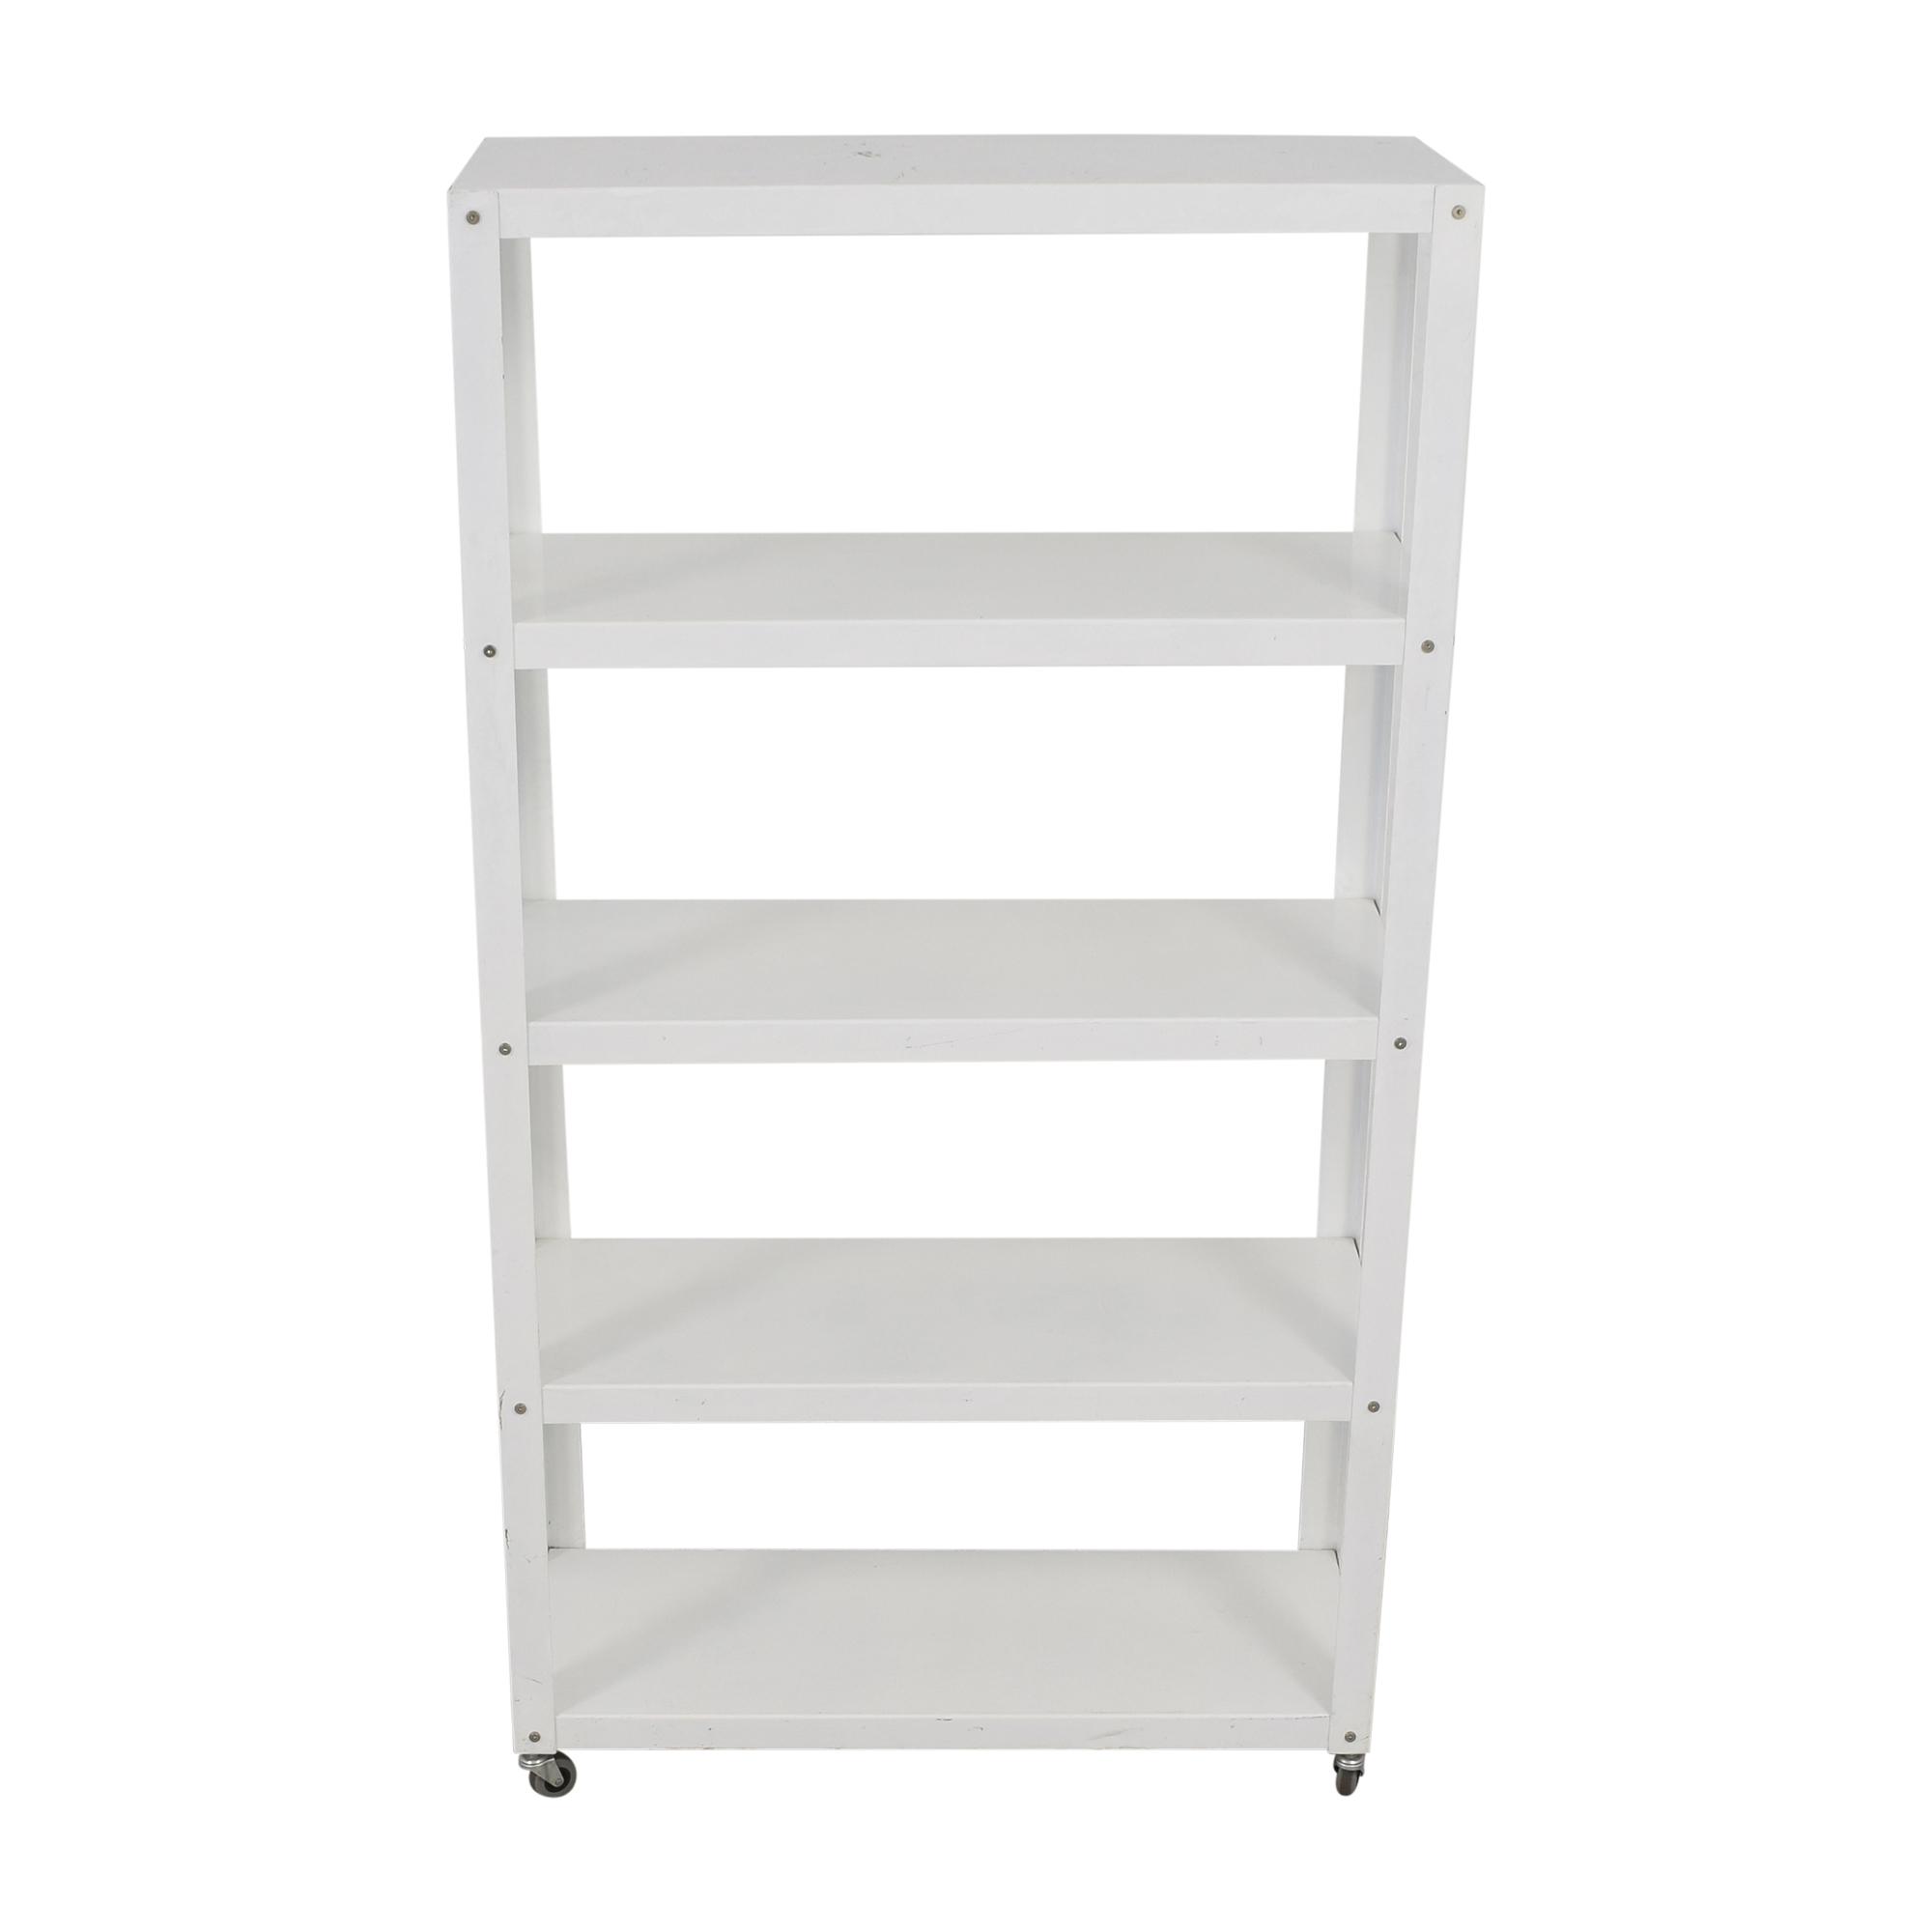 CB2 CB2 Go-Cart Rolling Bookcase dimensions